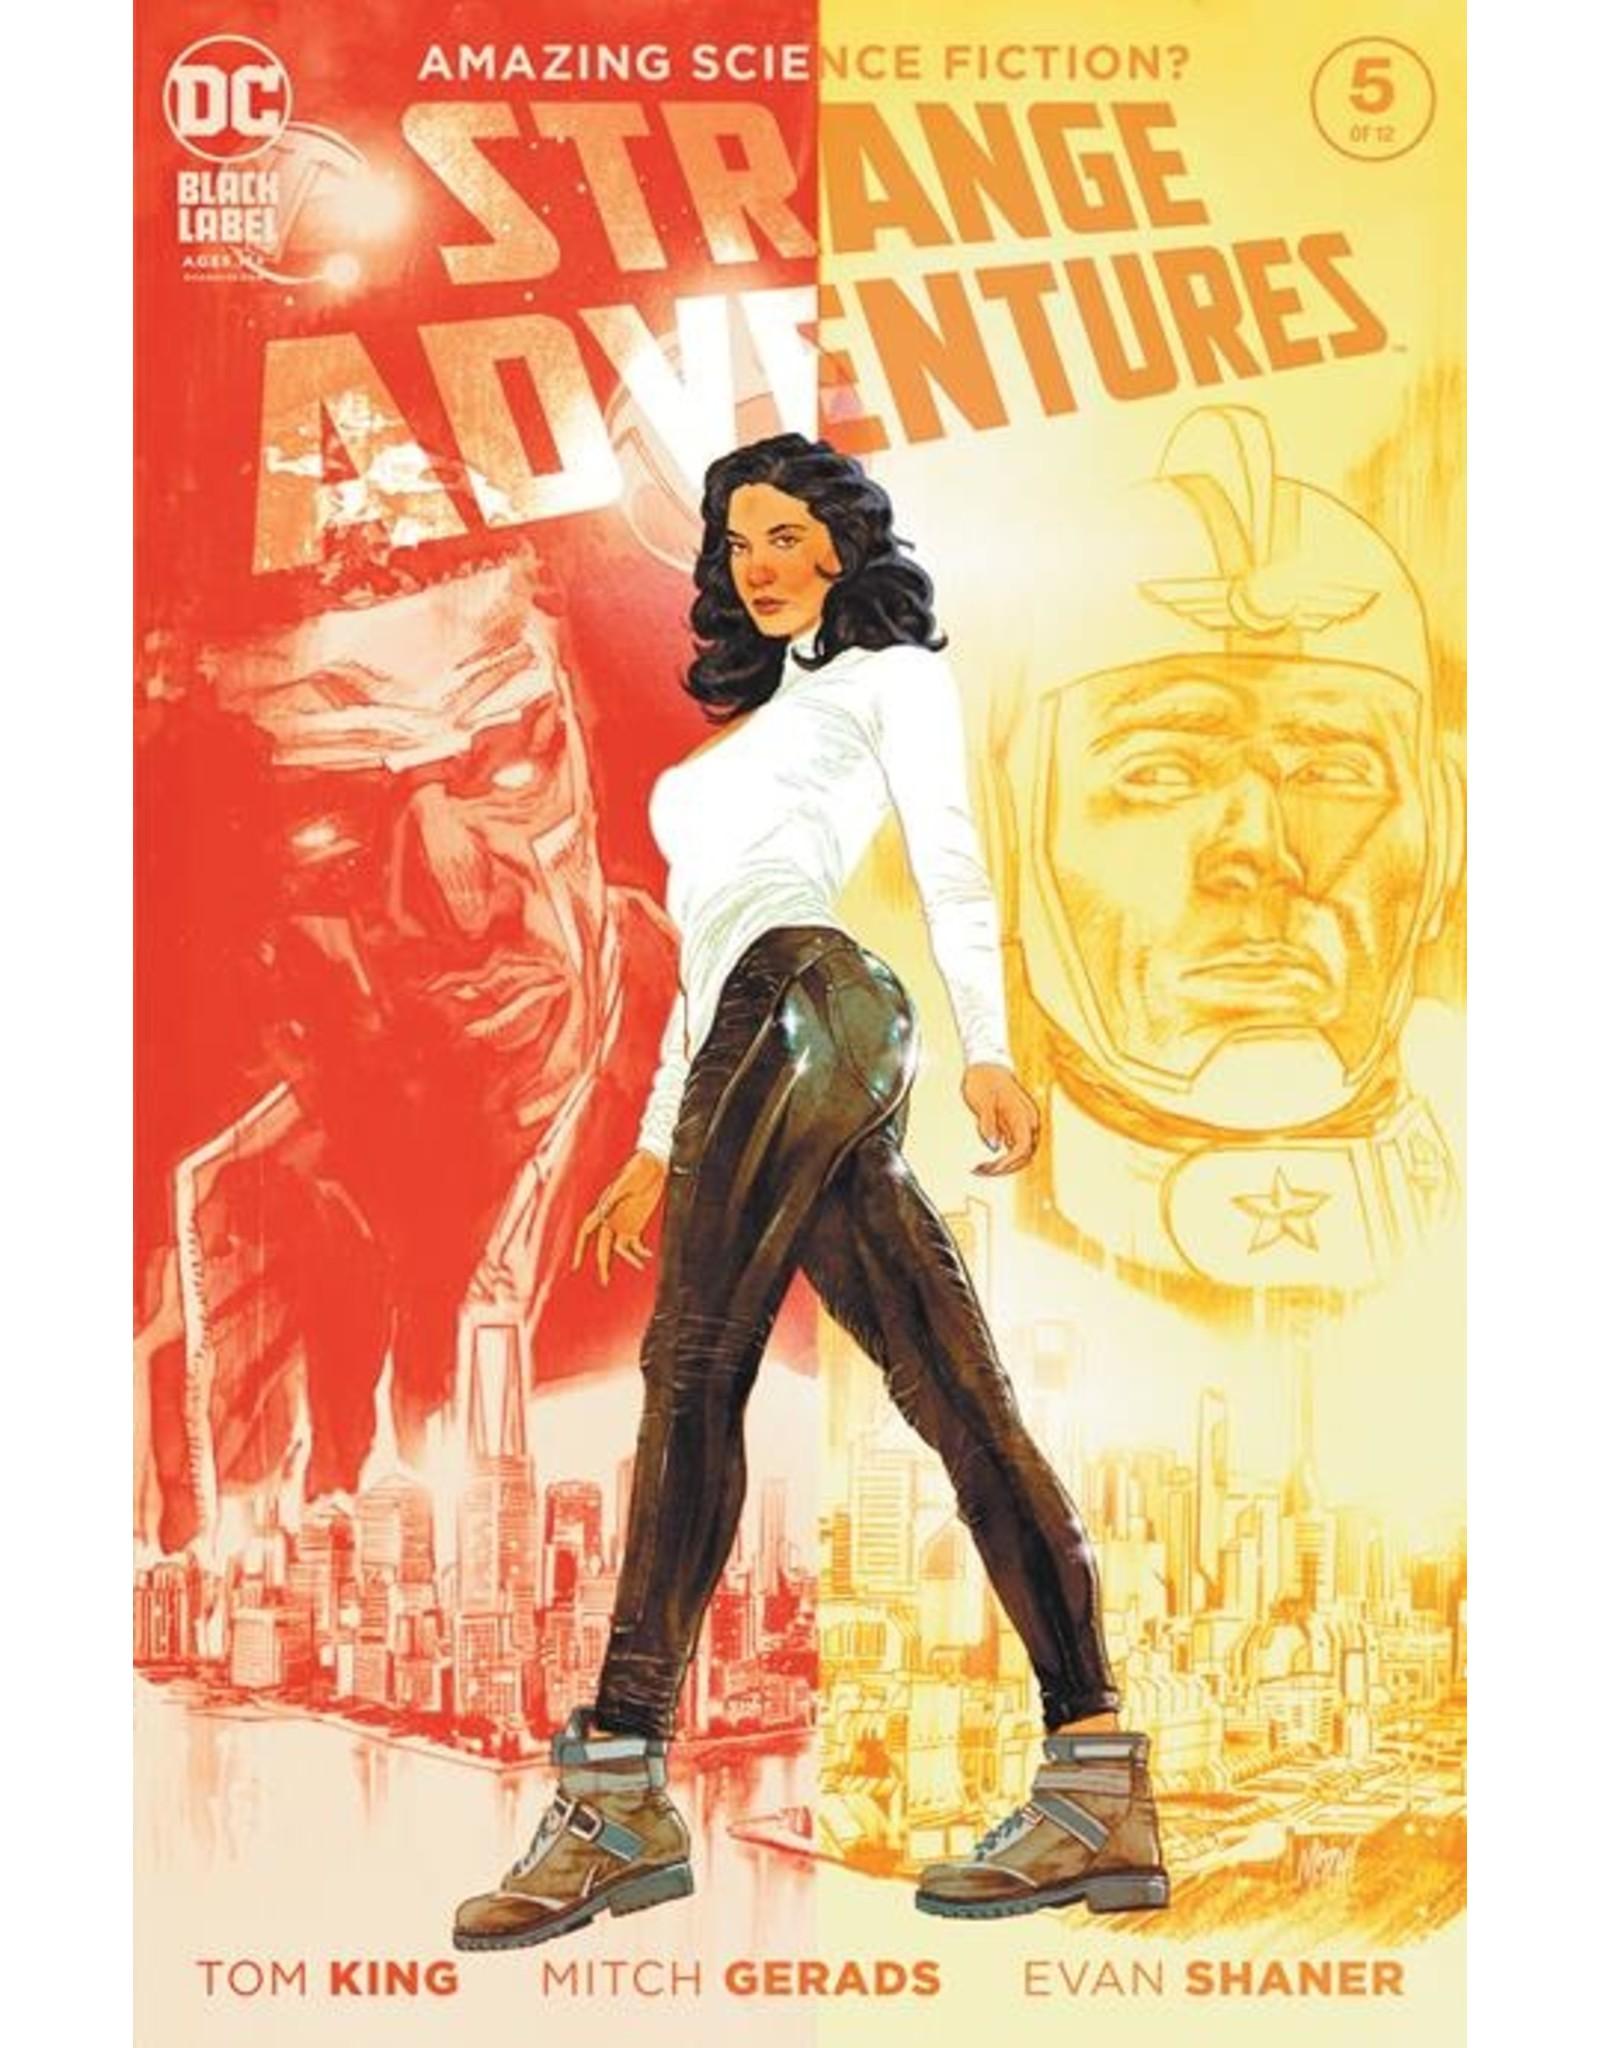 DC COMICS STRANGE ADVENTURES #5 (OF 12) CVR A MITCH GERADS